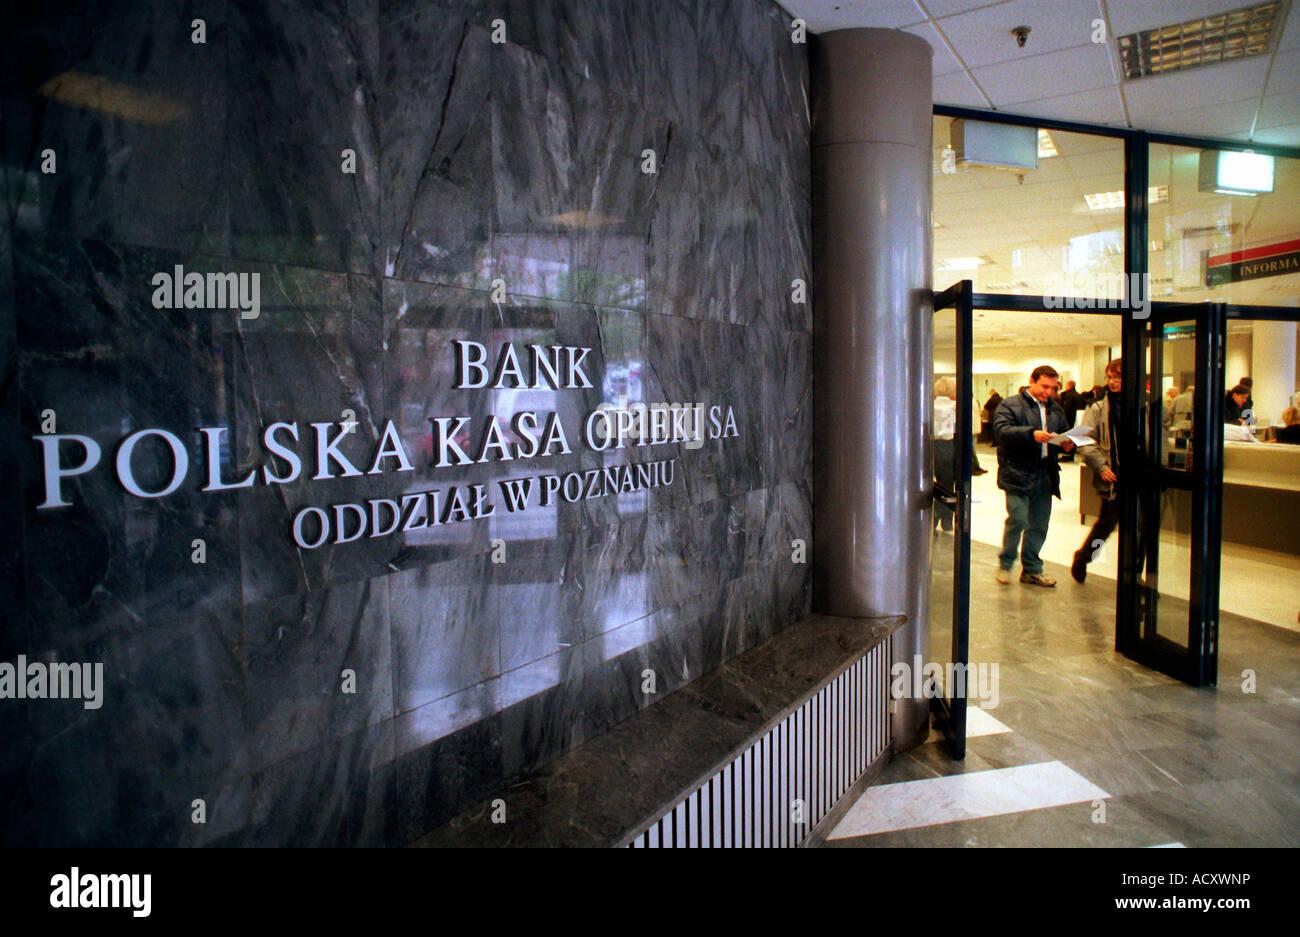 Bank polska kasa opieki форекс индикатор nlotion news reader